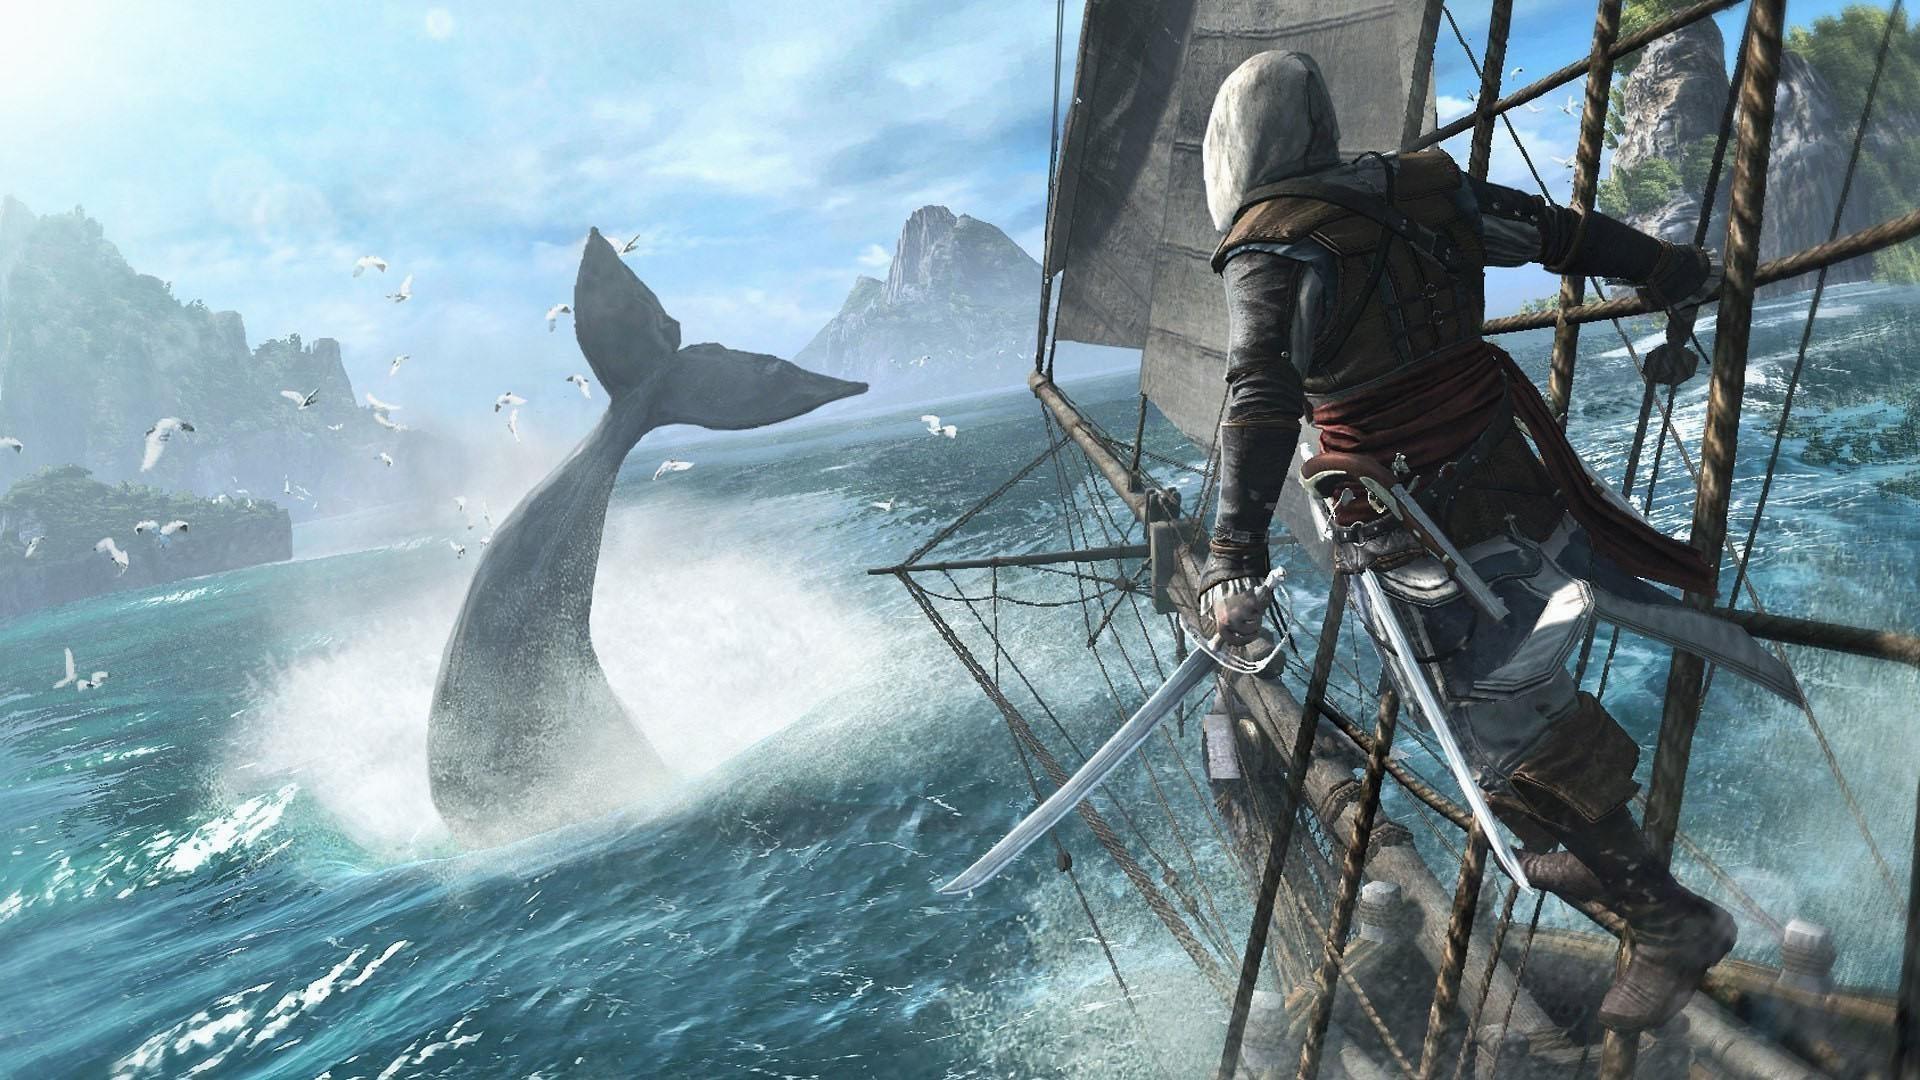 wallpaper.wiki-Amazing-Assassins-Creed-Black-Flag-1920×1080-